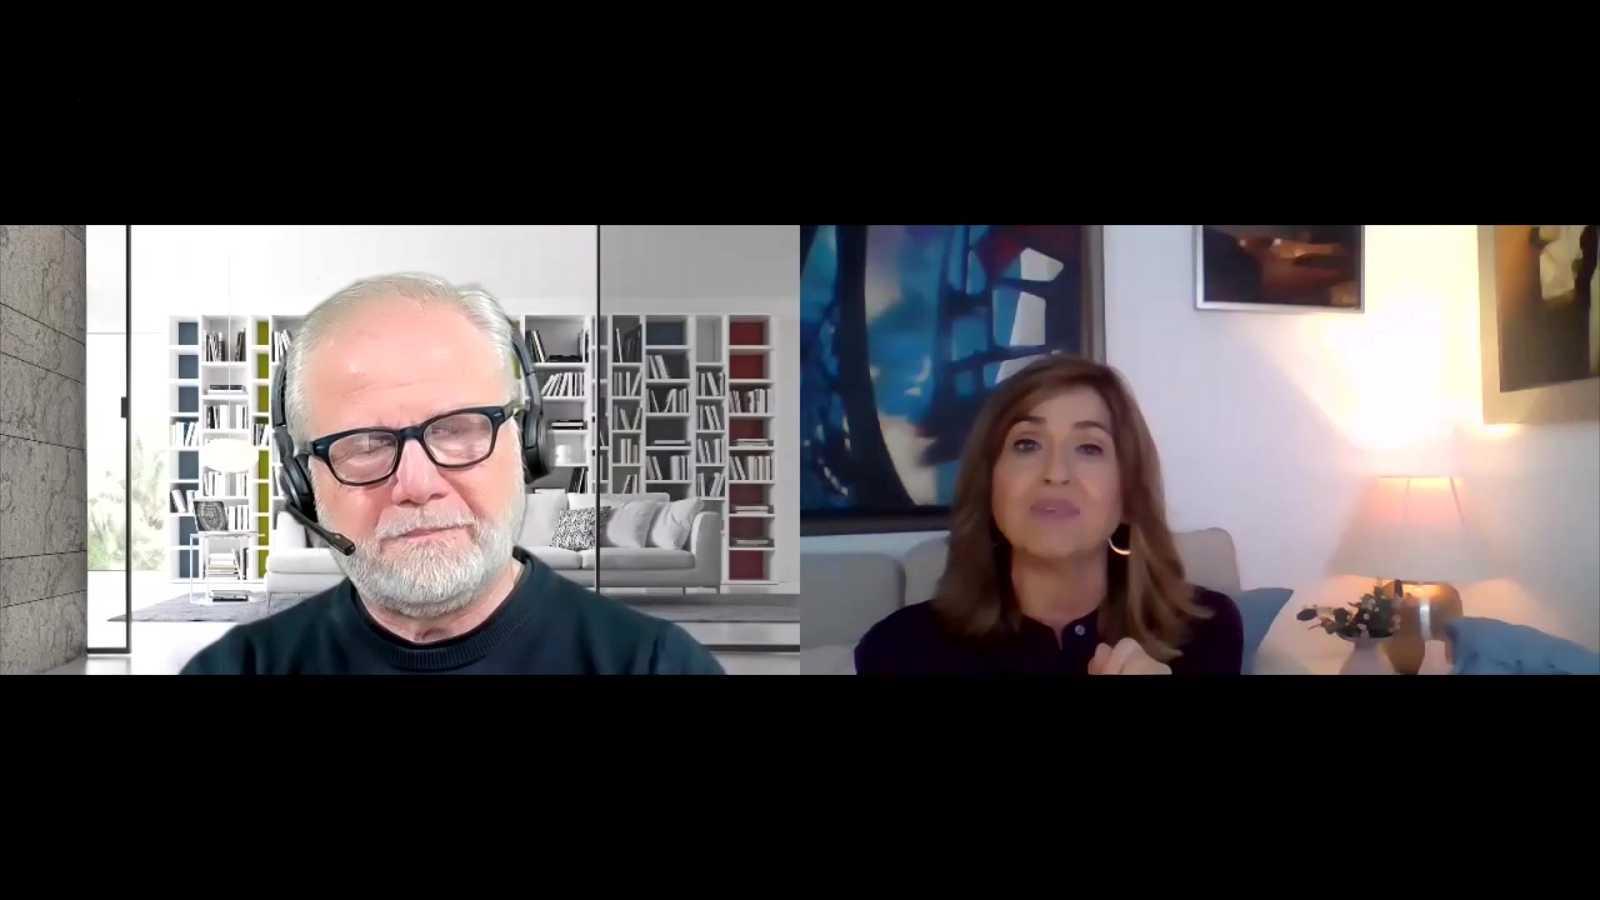 Shalom - Pablo Heinig: aprende a diseñar tu futuro - ver ahora